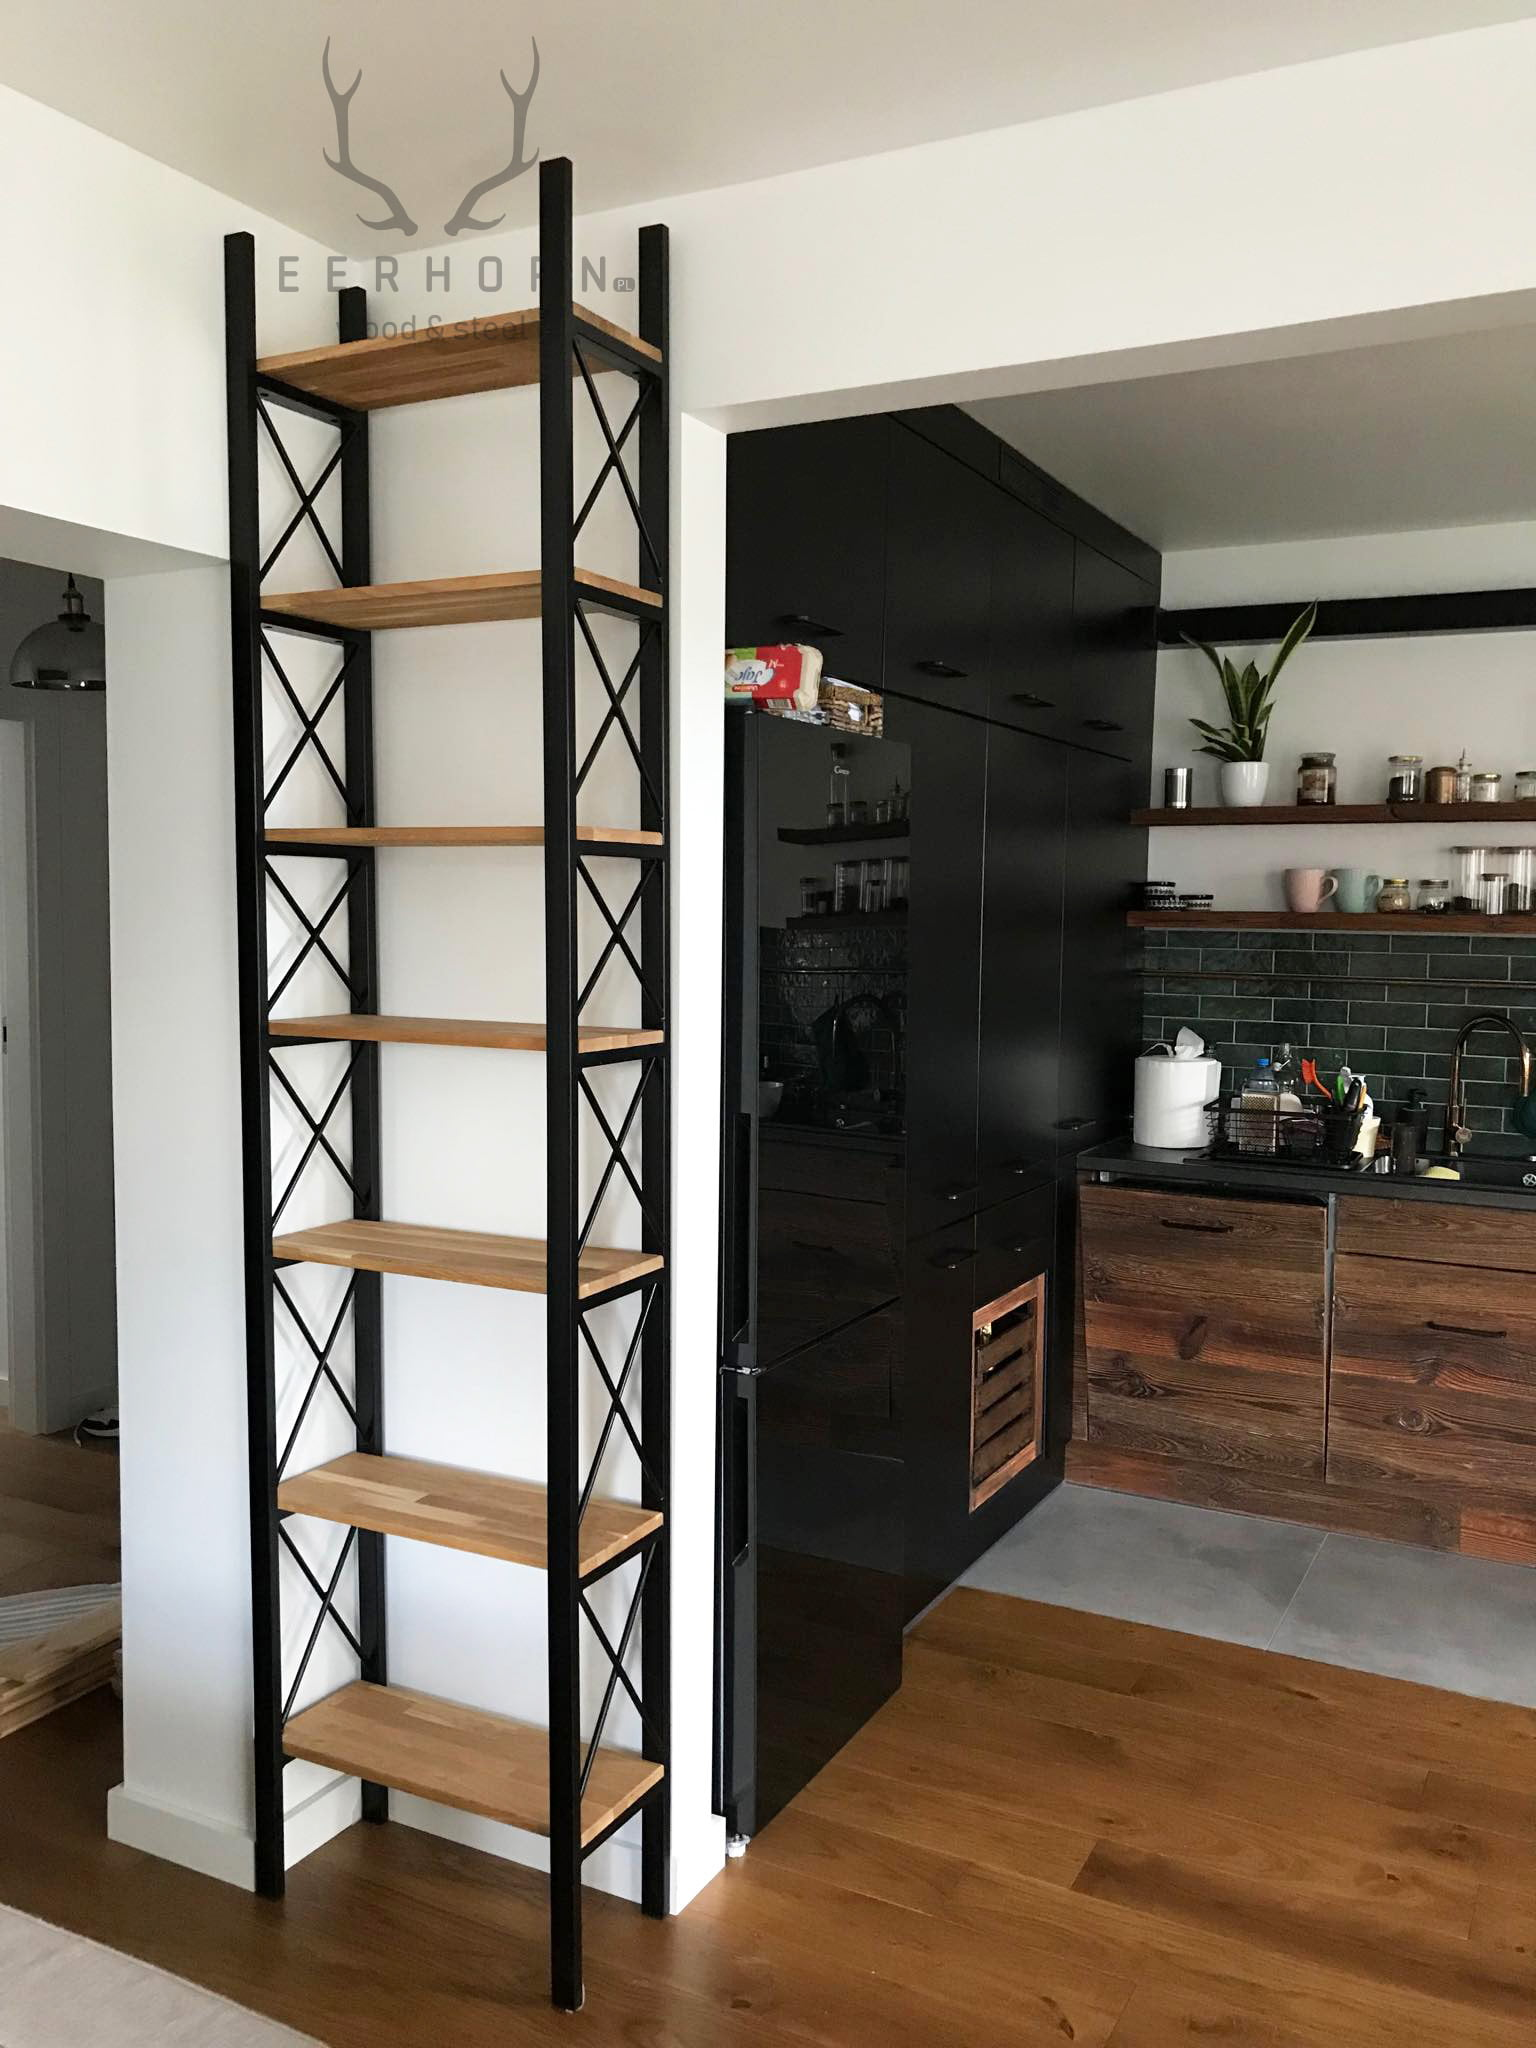 meble loftowe do domu